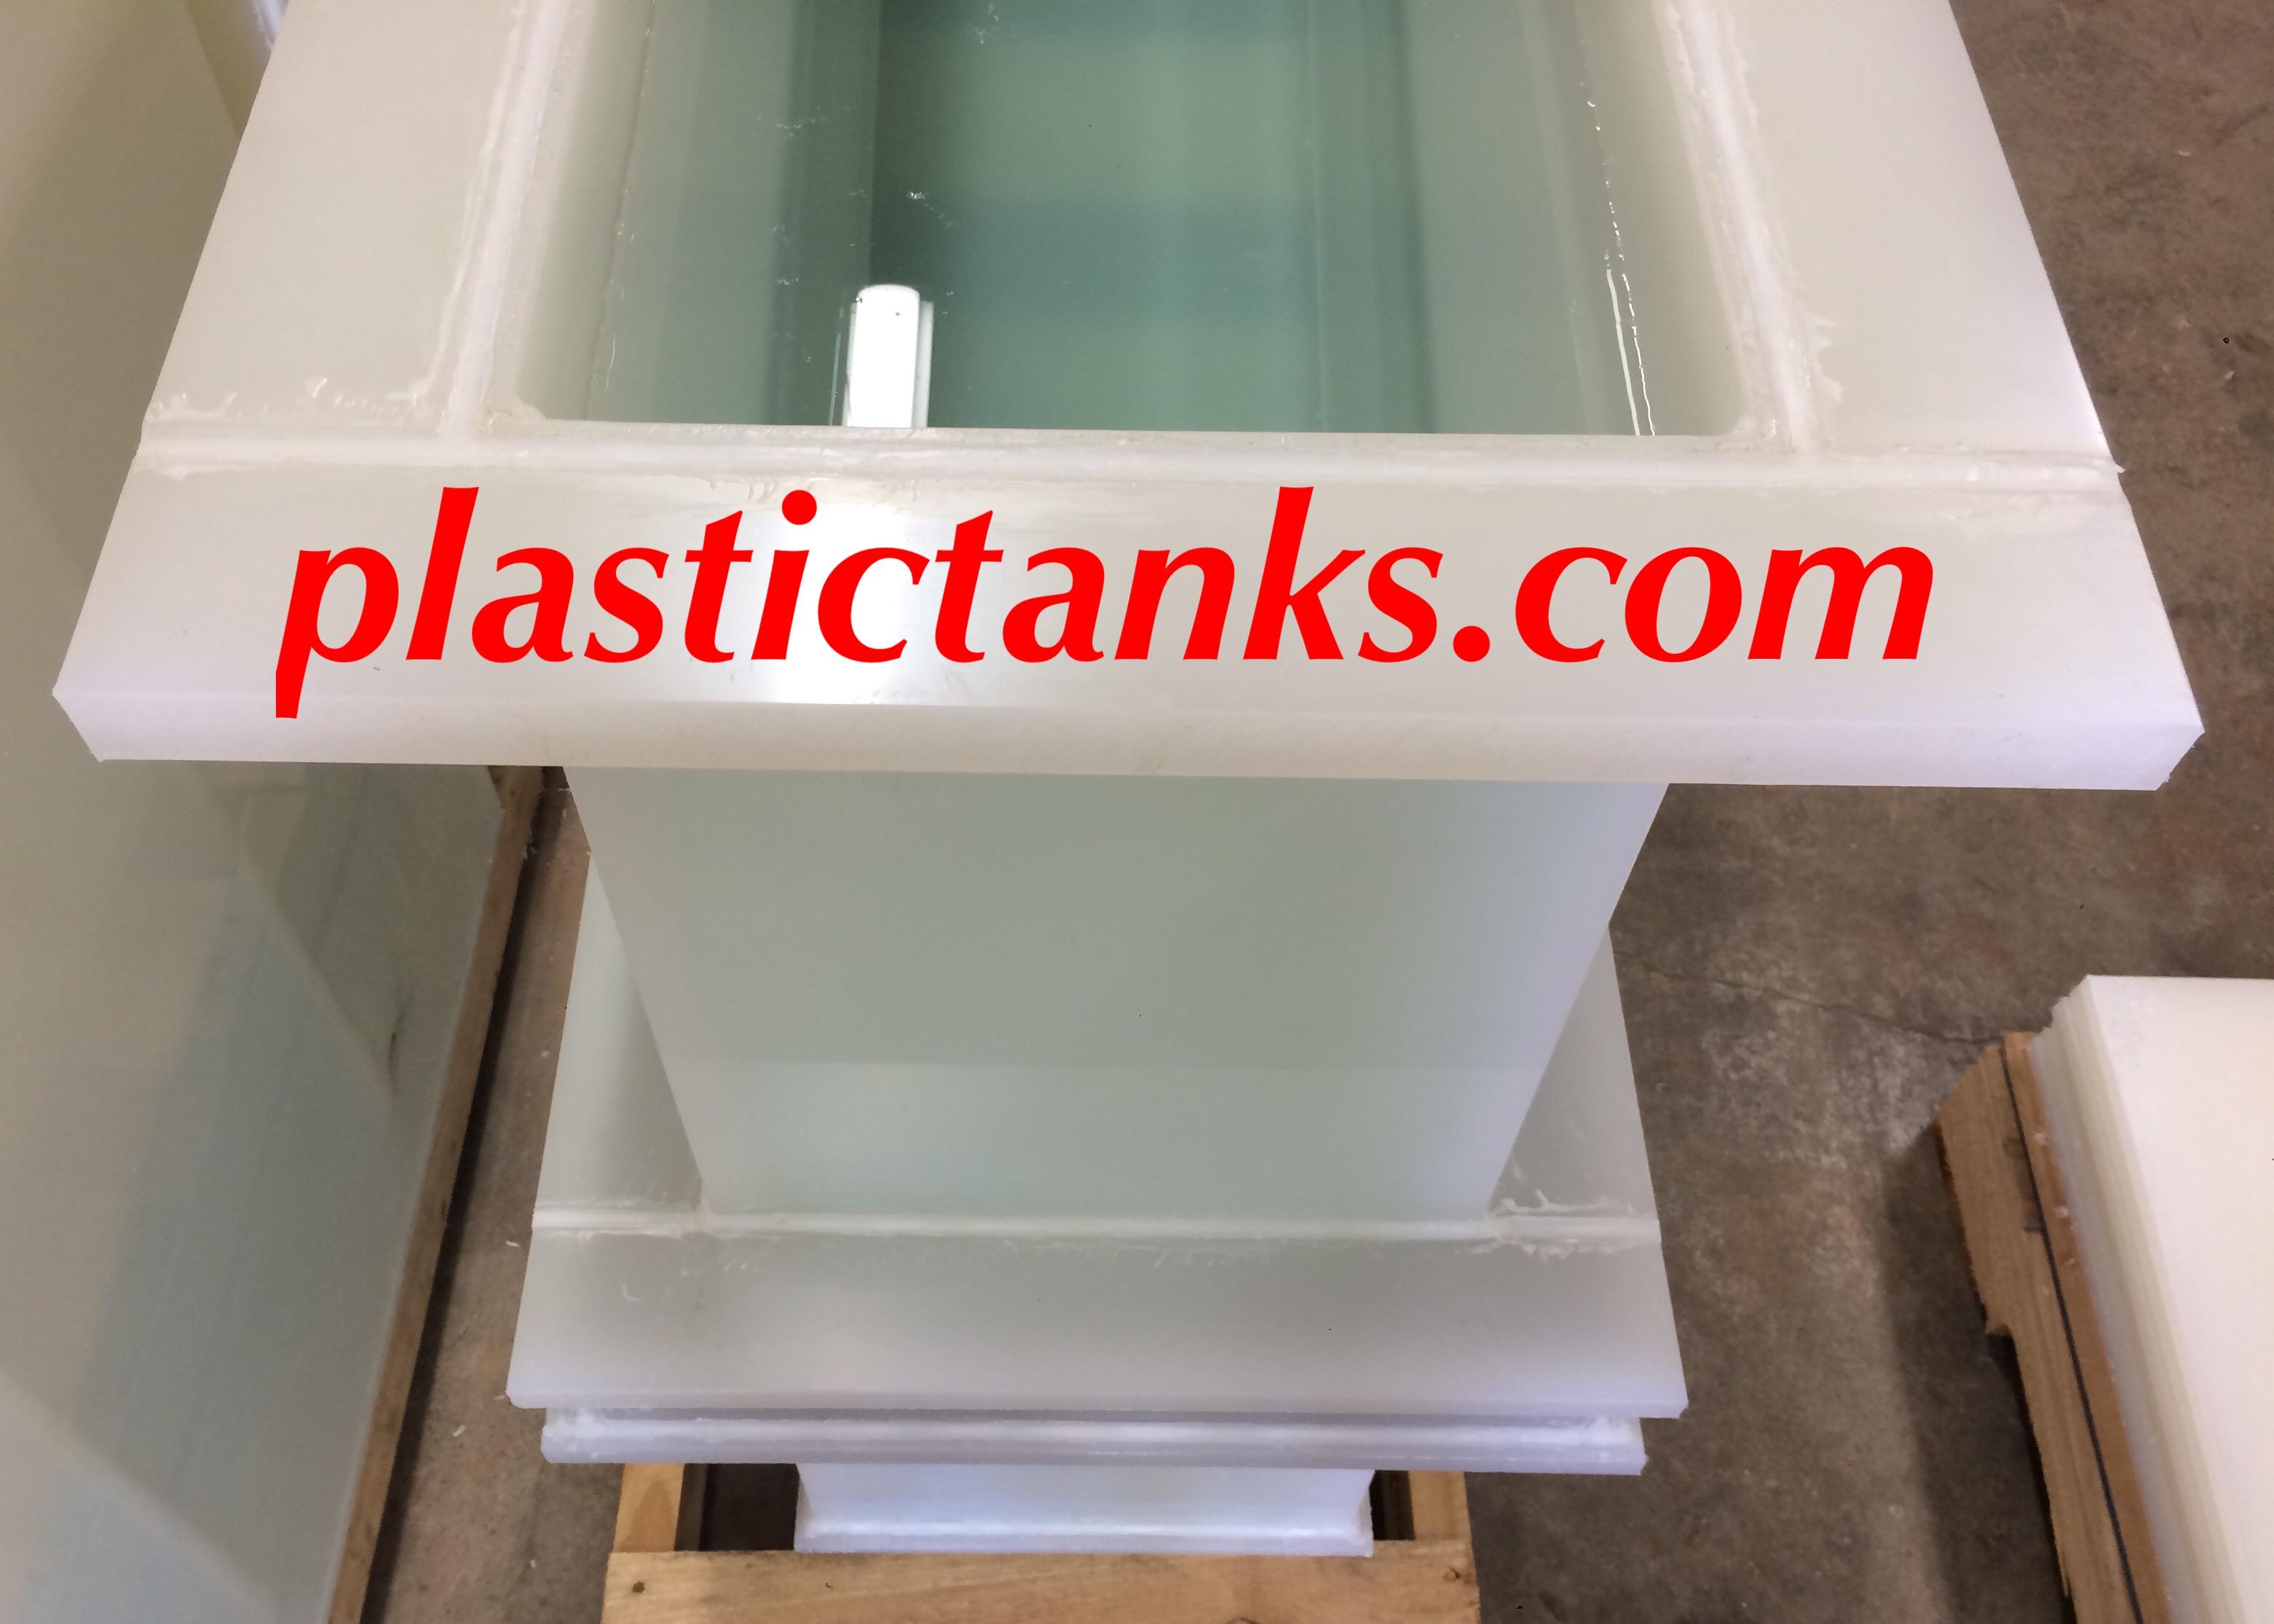 small plating tank